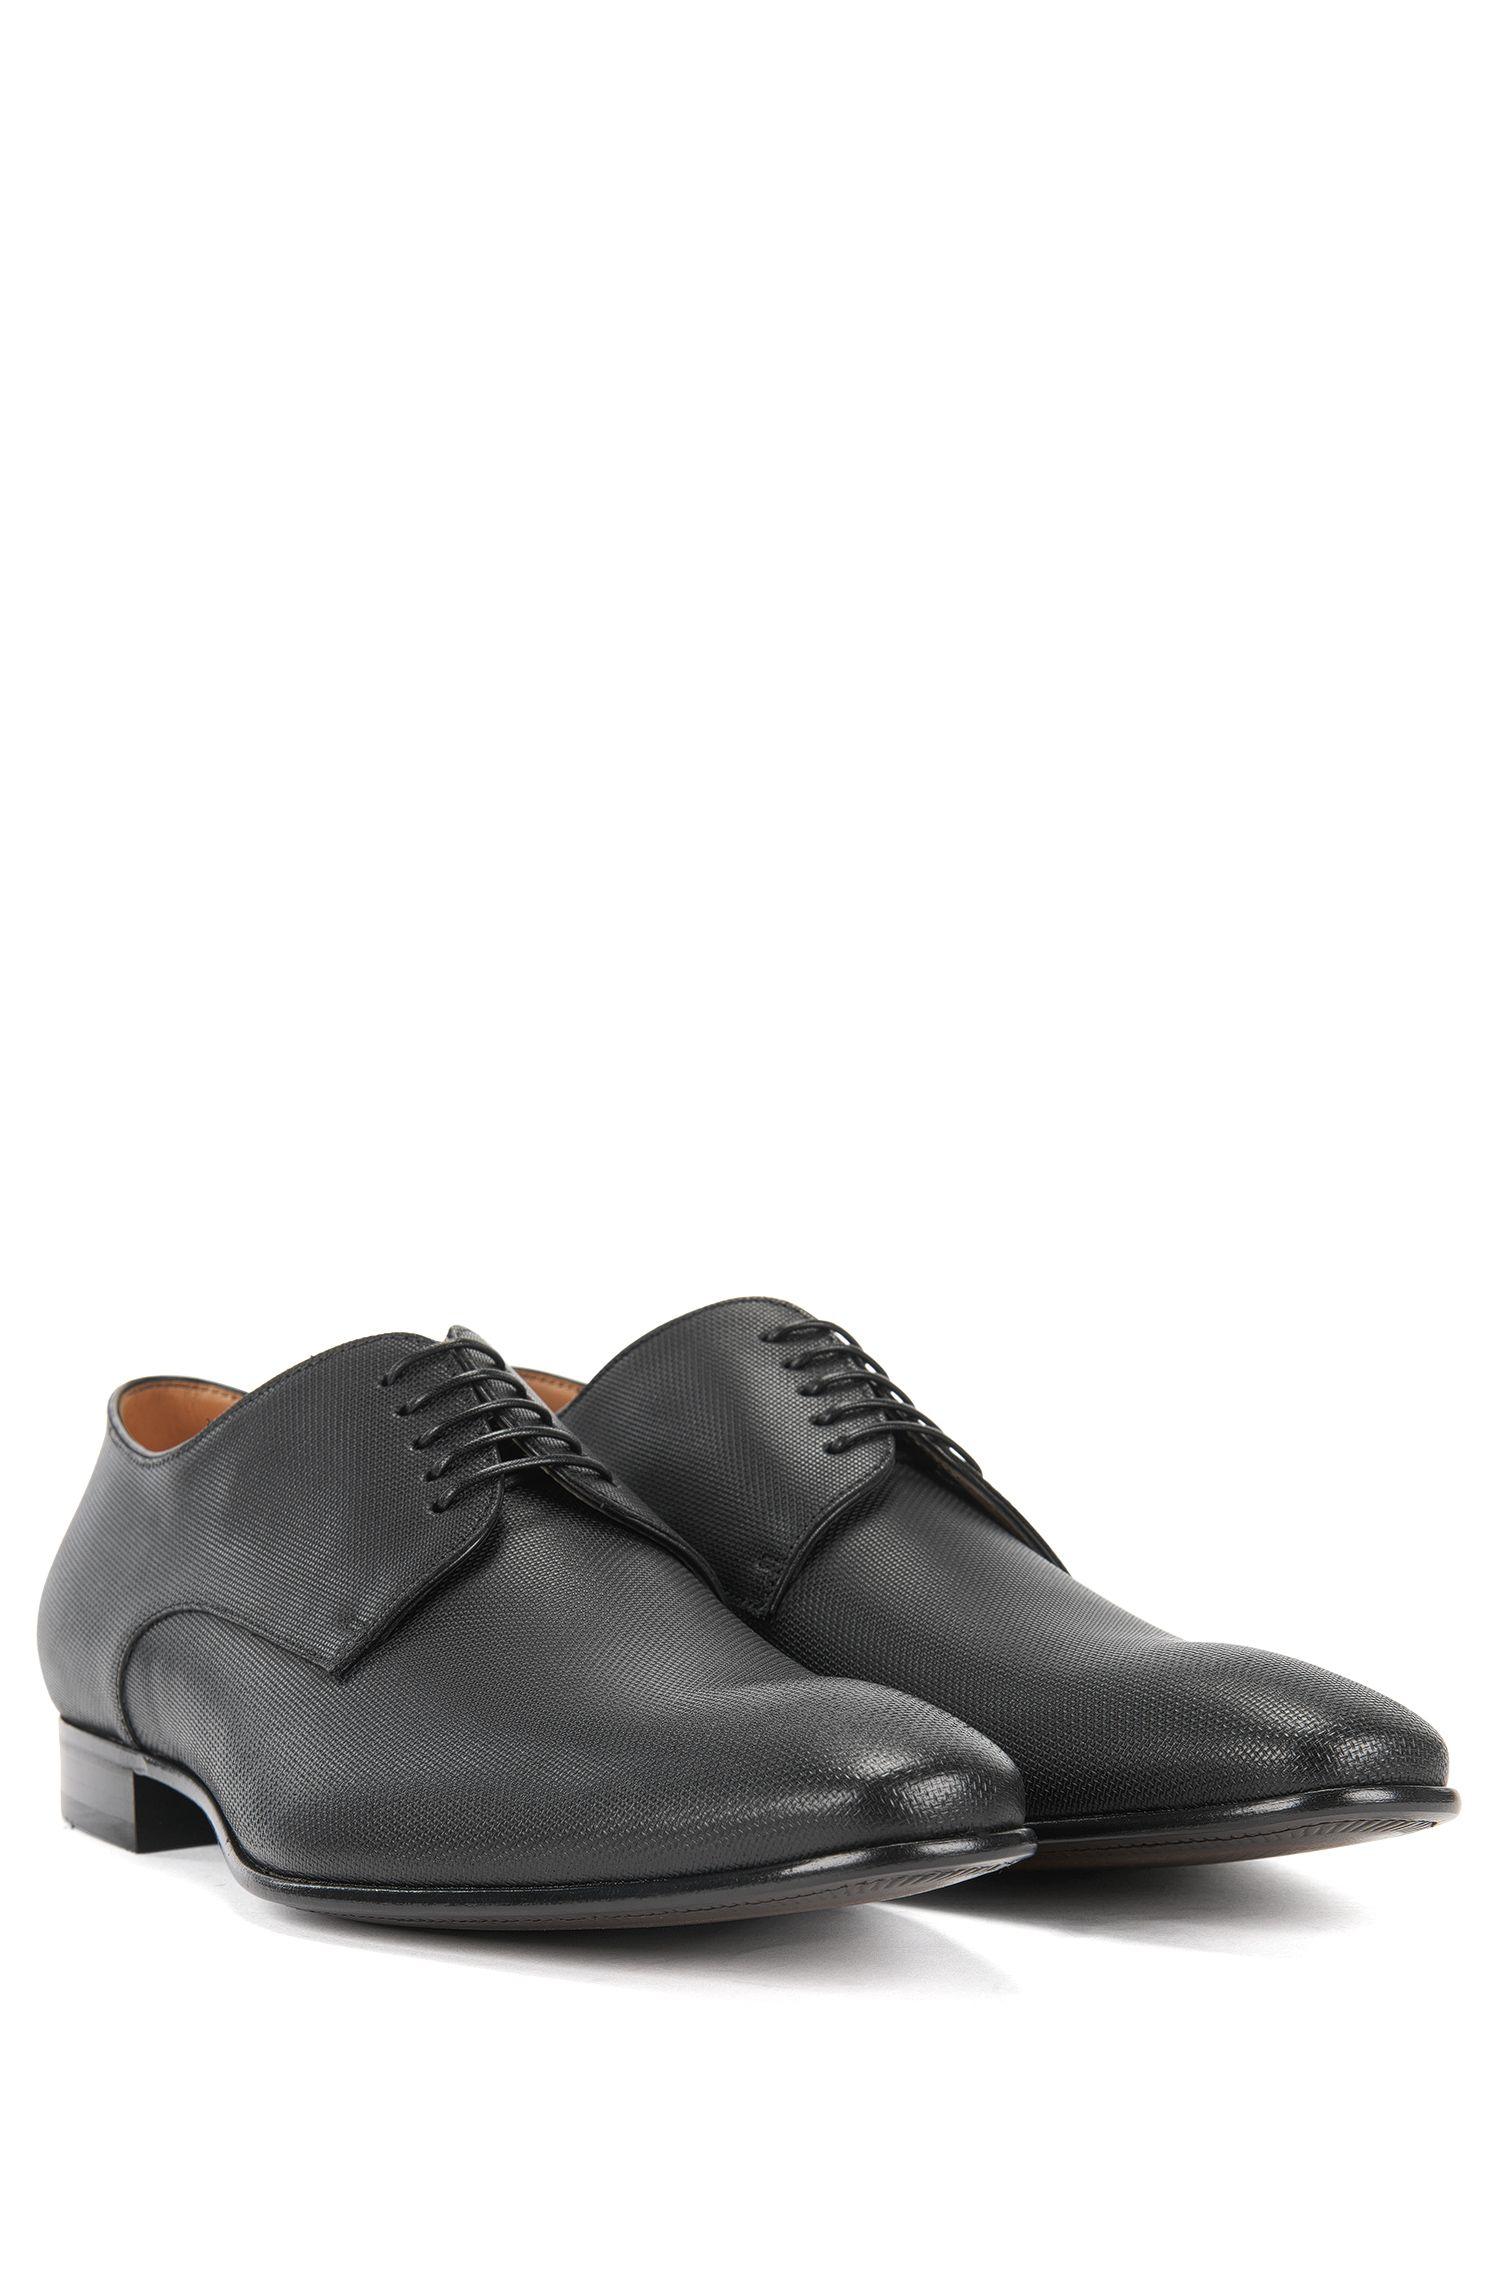 Italian Leather Derby Dress Shoe | Prindo, Black